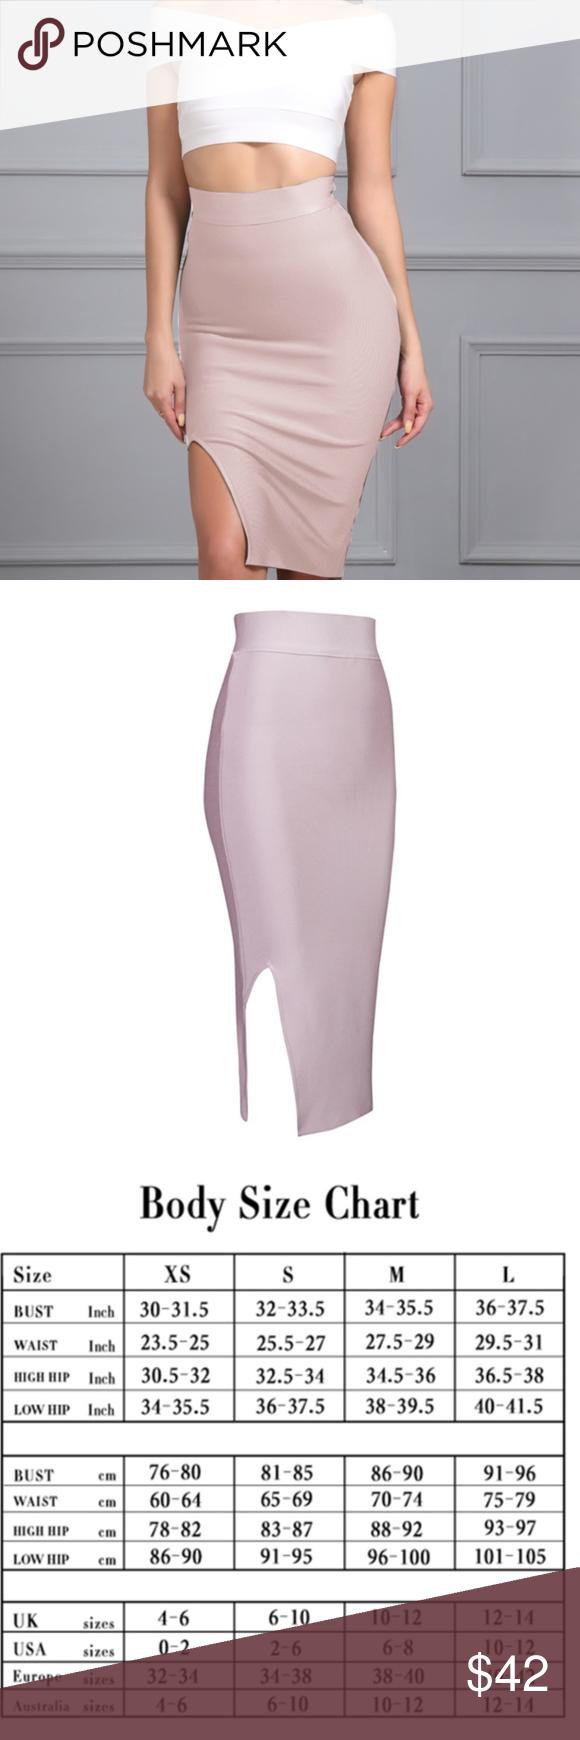 Light Pink Slit Midi Bandage Skirt Boutique & Light Pink Slit Midi Bandage Skirt Boutique | Cleaning materials ... azcodes.com